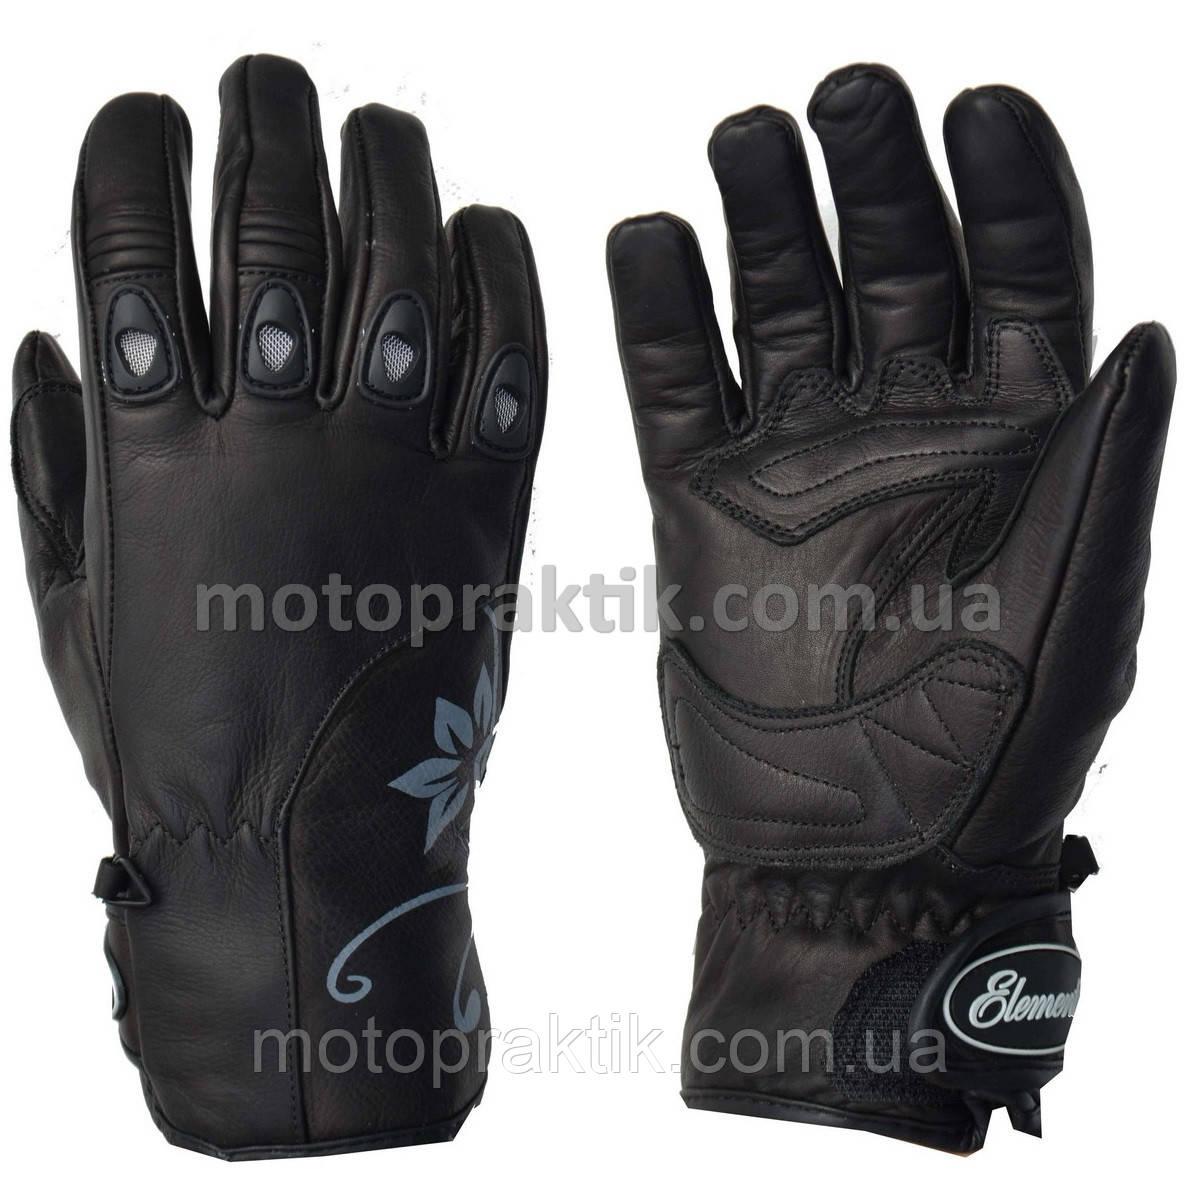 Elemento 206 Lady Gloves Blk/Gry, L Мотоперчатки жіночі